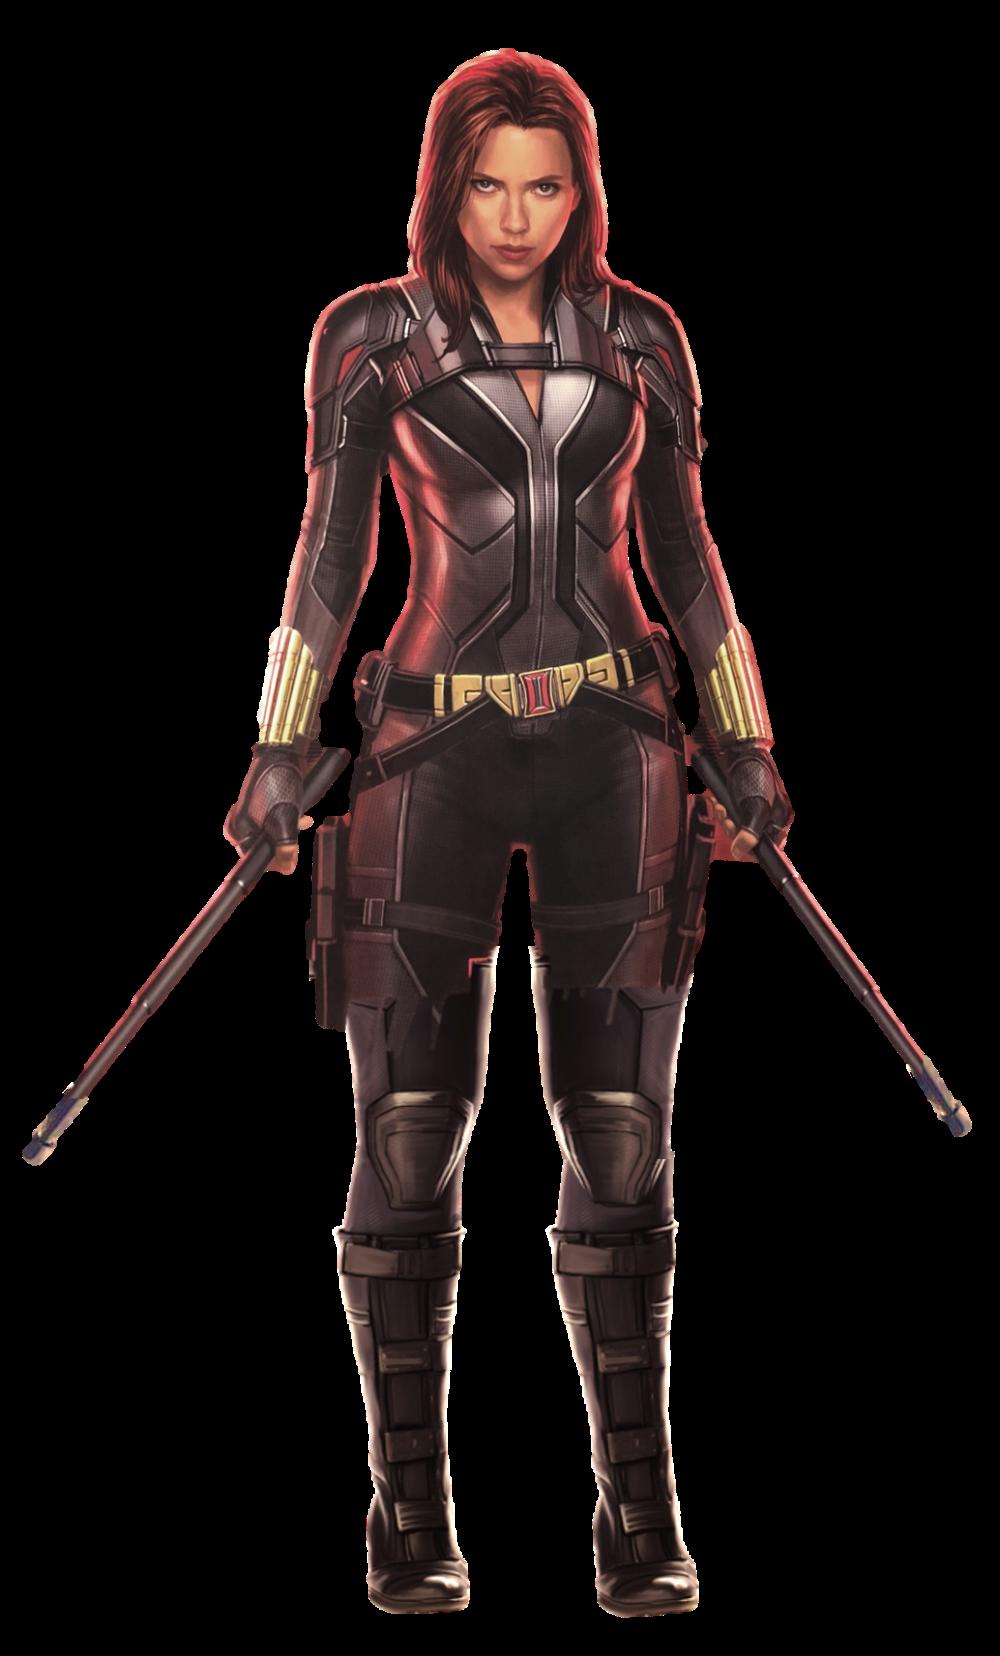 Black Widow 2 Movie Png By Captain Kingsman16 On Deviantart Black Widow Marvel Black Widow Movie Black Widow Avengers